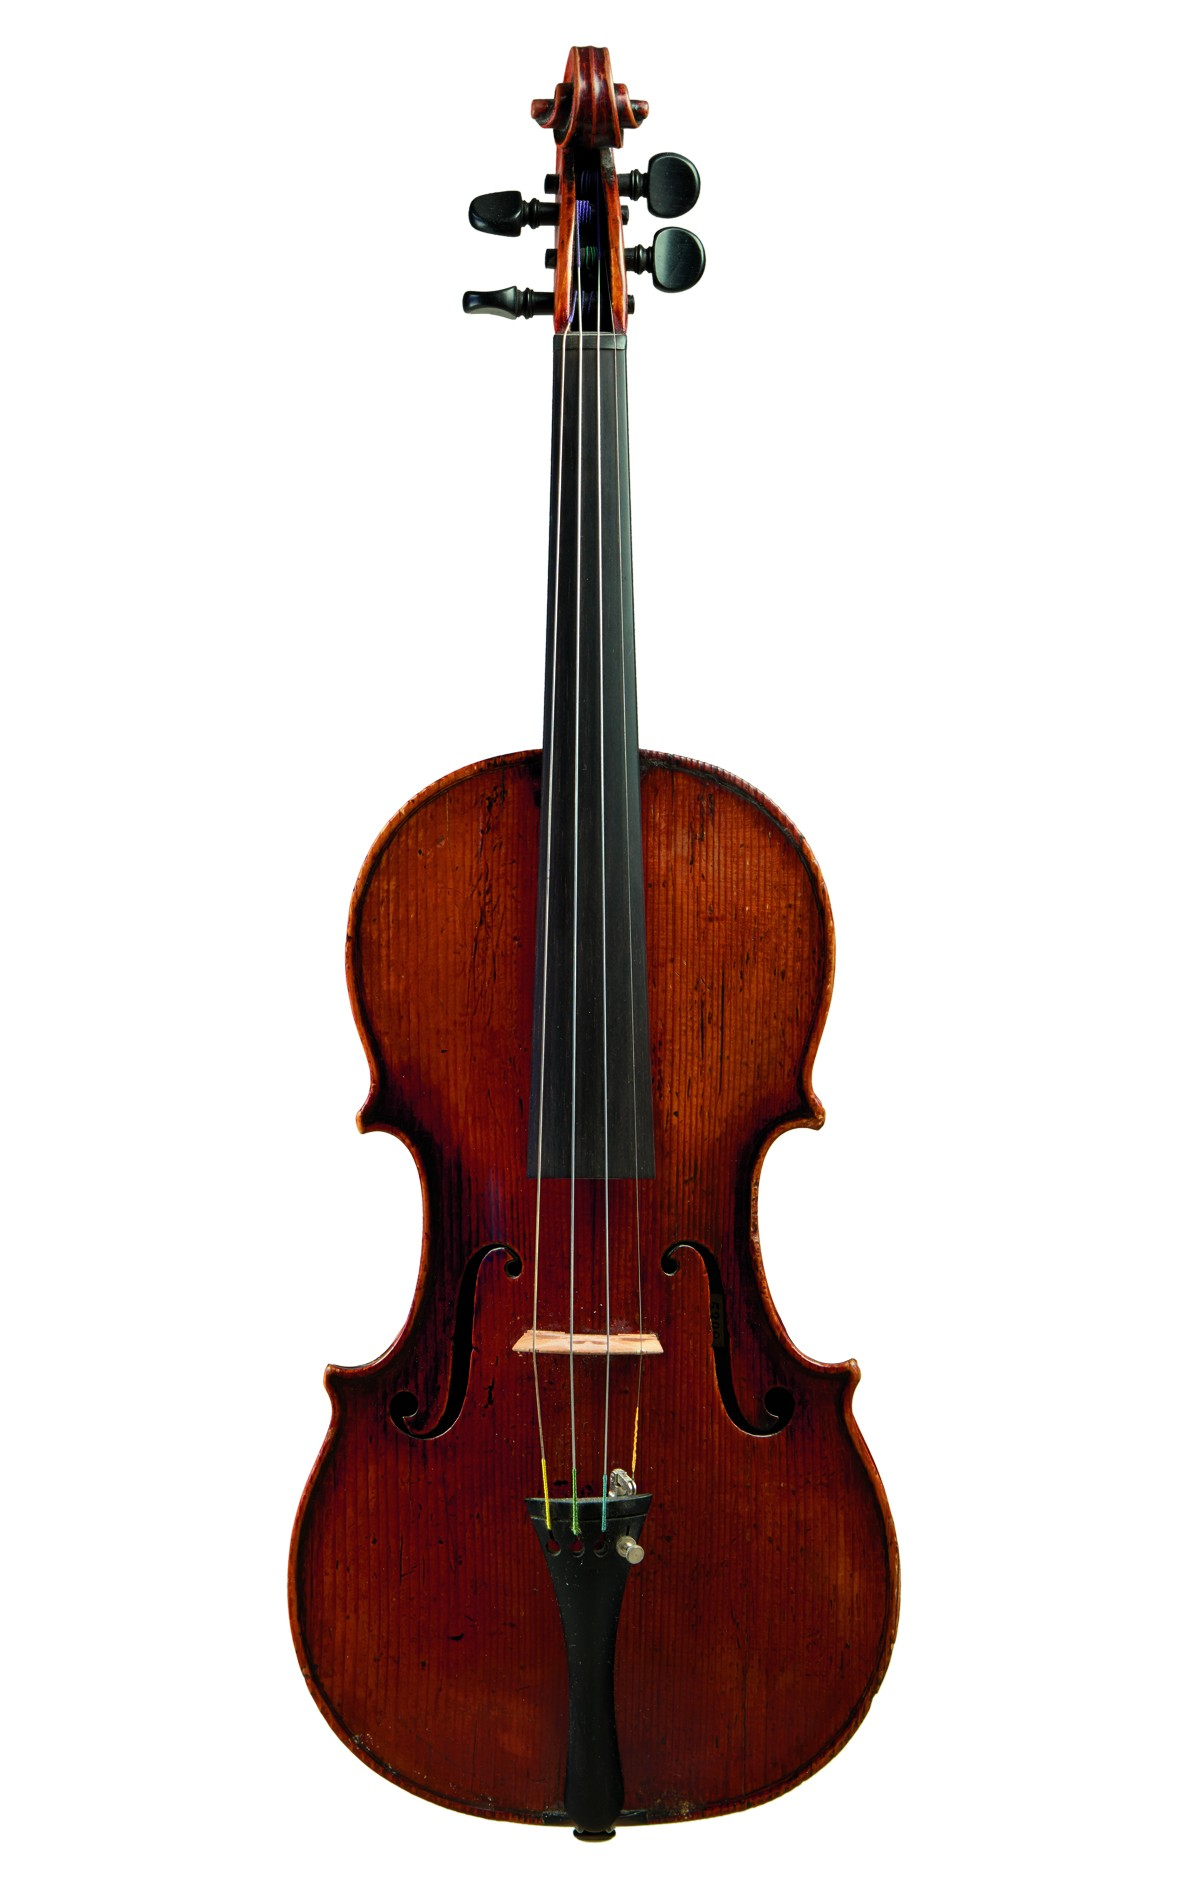 Meinradus Frank violin - STOLEN July 2019 in Germany